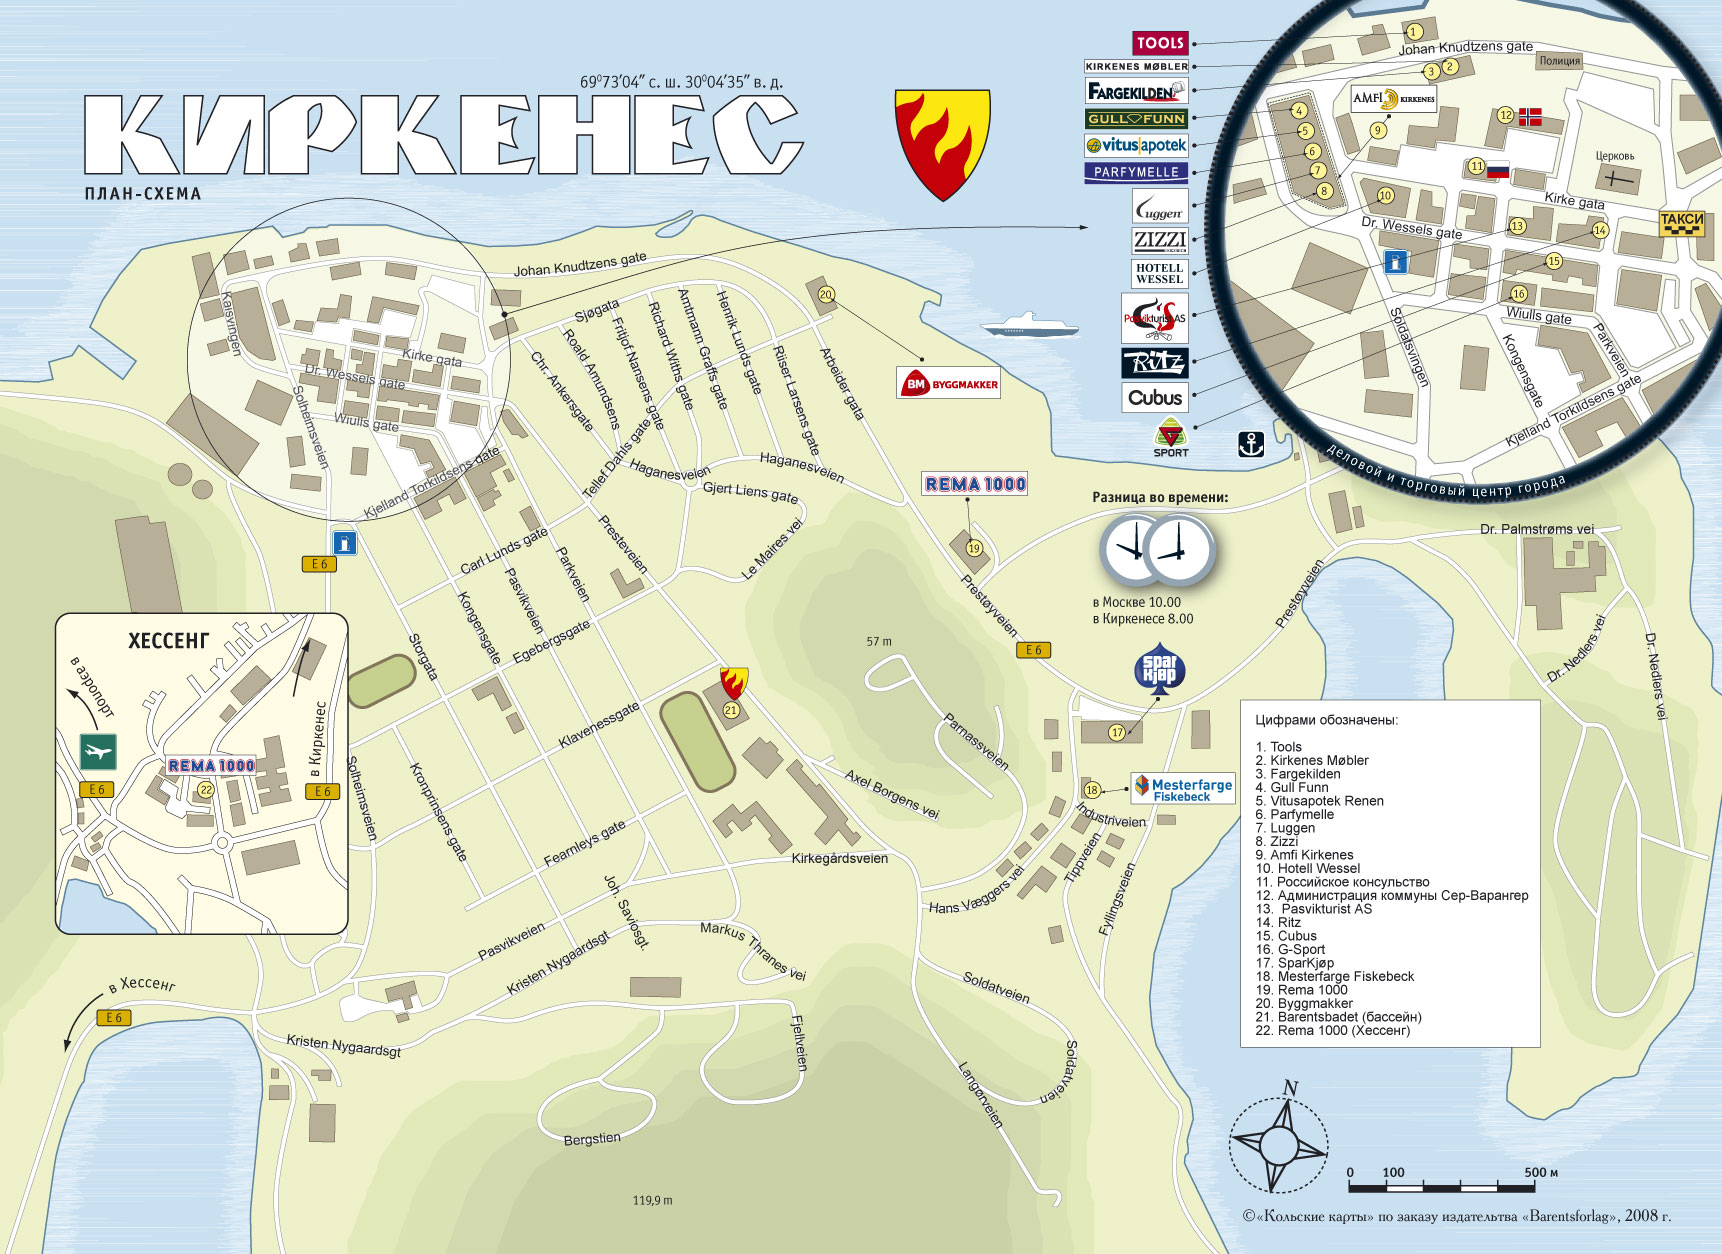 http://www.kolamap.ru/topo/map_img/norge/map_kirkenes_.jpg